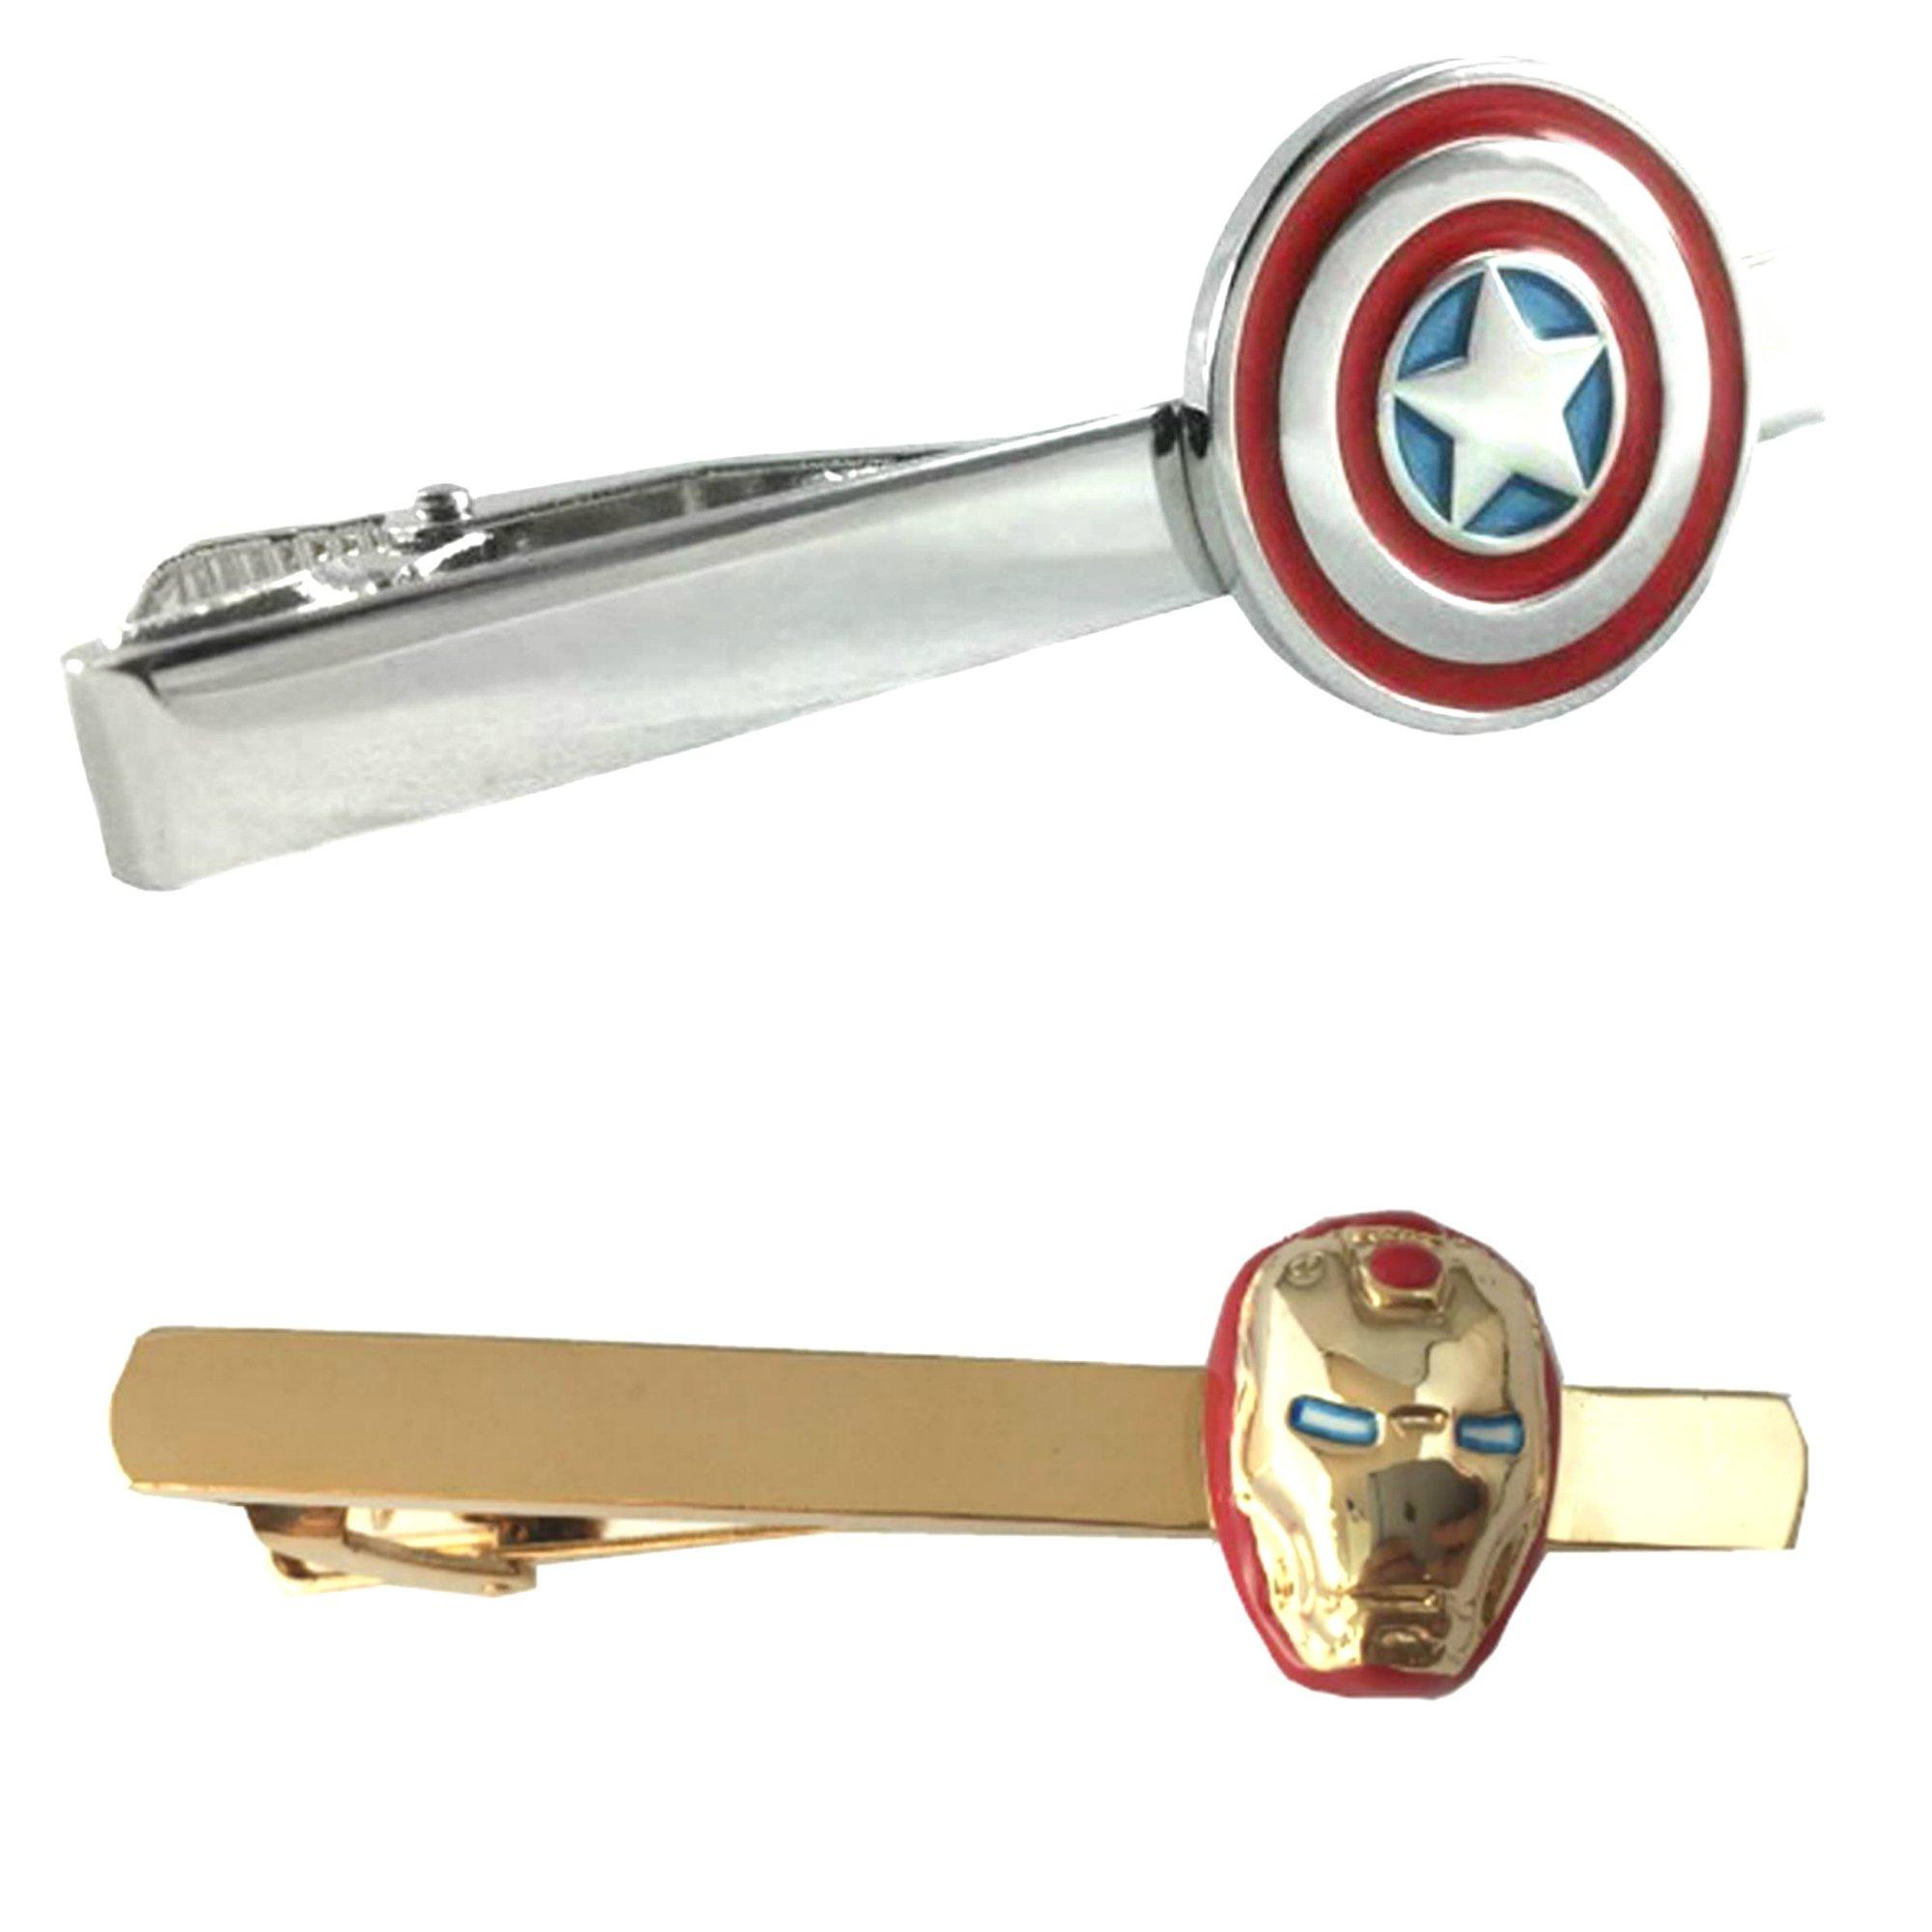 Outlander Marvel Comics - Captain America & Ironman - Tiebar Tie Clasp Set of 2 Wedding Superhero Logo w/Gift Box